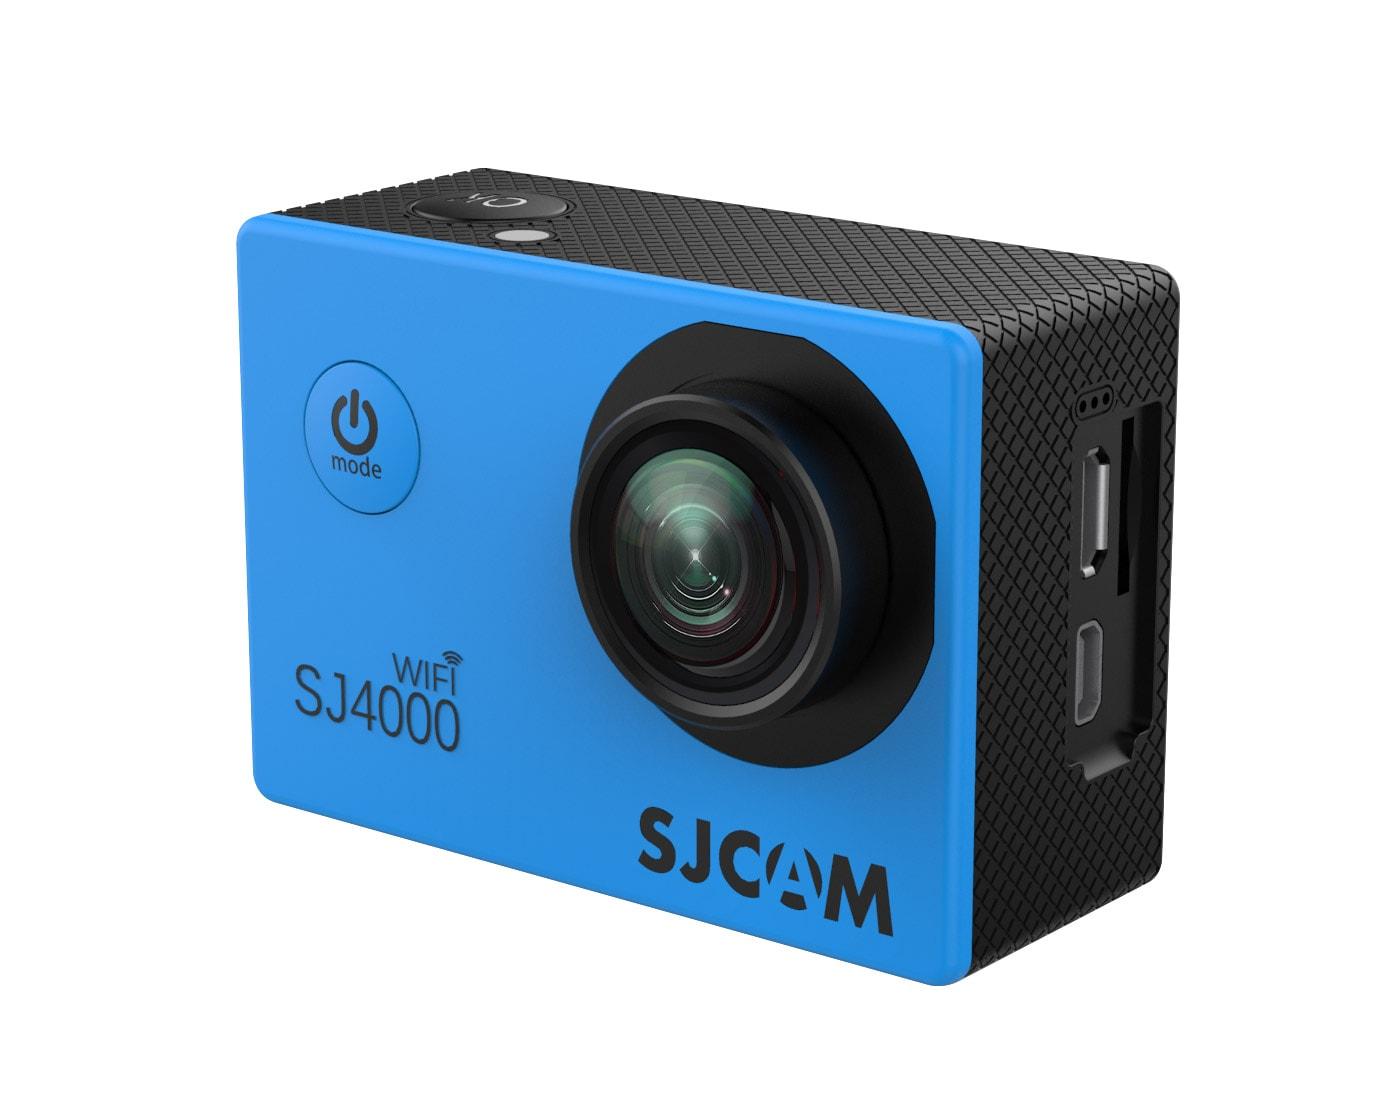 SJCAM SJ4000 WIFI Action Camera FHD1080P waterproof Underwater Camera 12MP Sports Camcorder  Red - 3